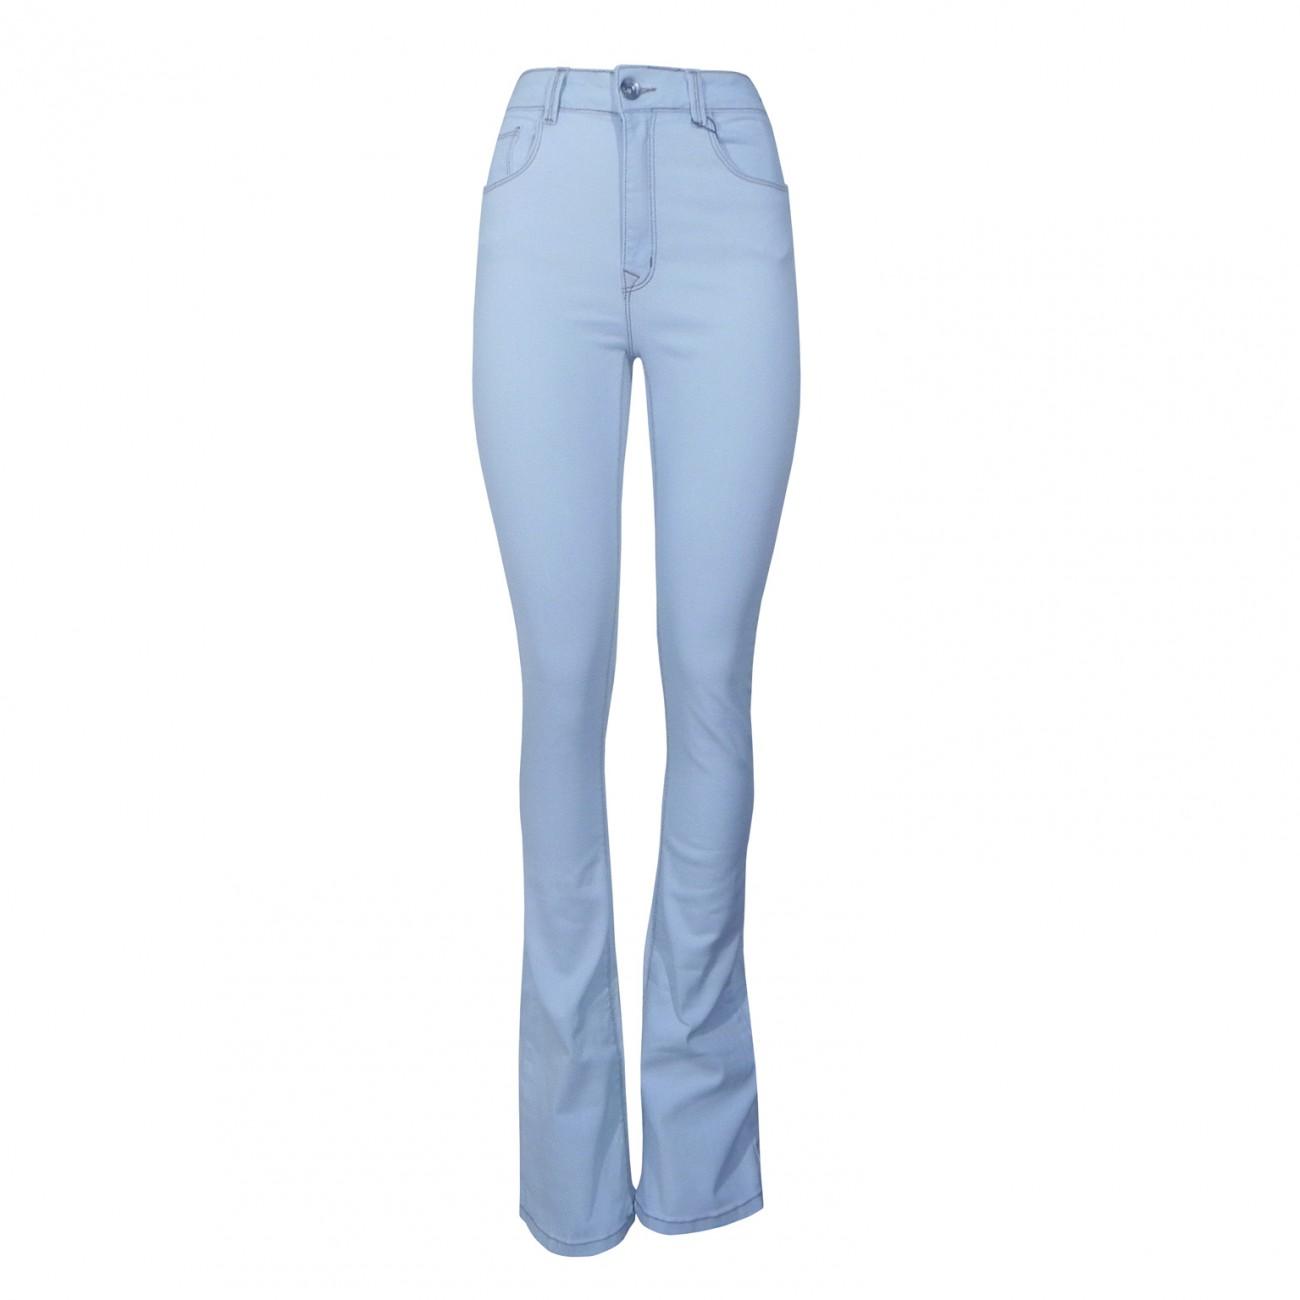 f497dacf4 Calça Jeans Feminina Clara Lez a Lez - Pole Modas